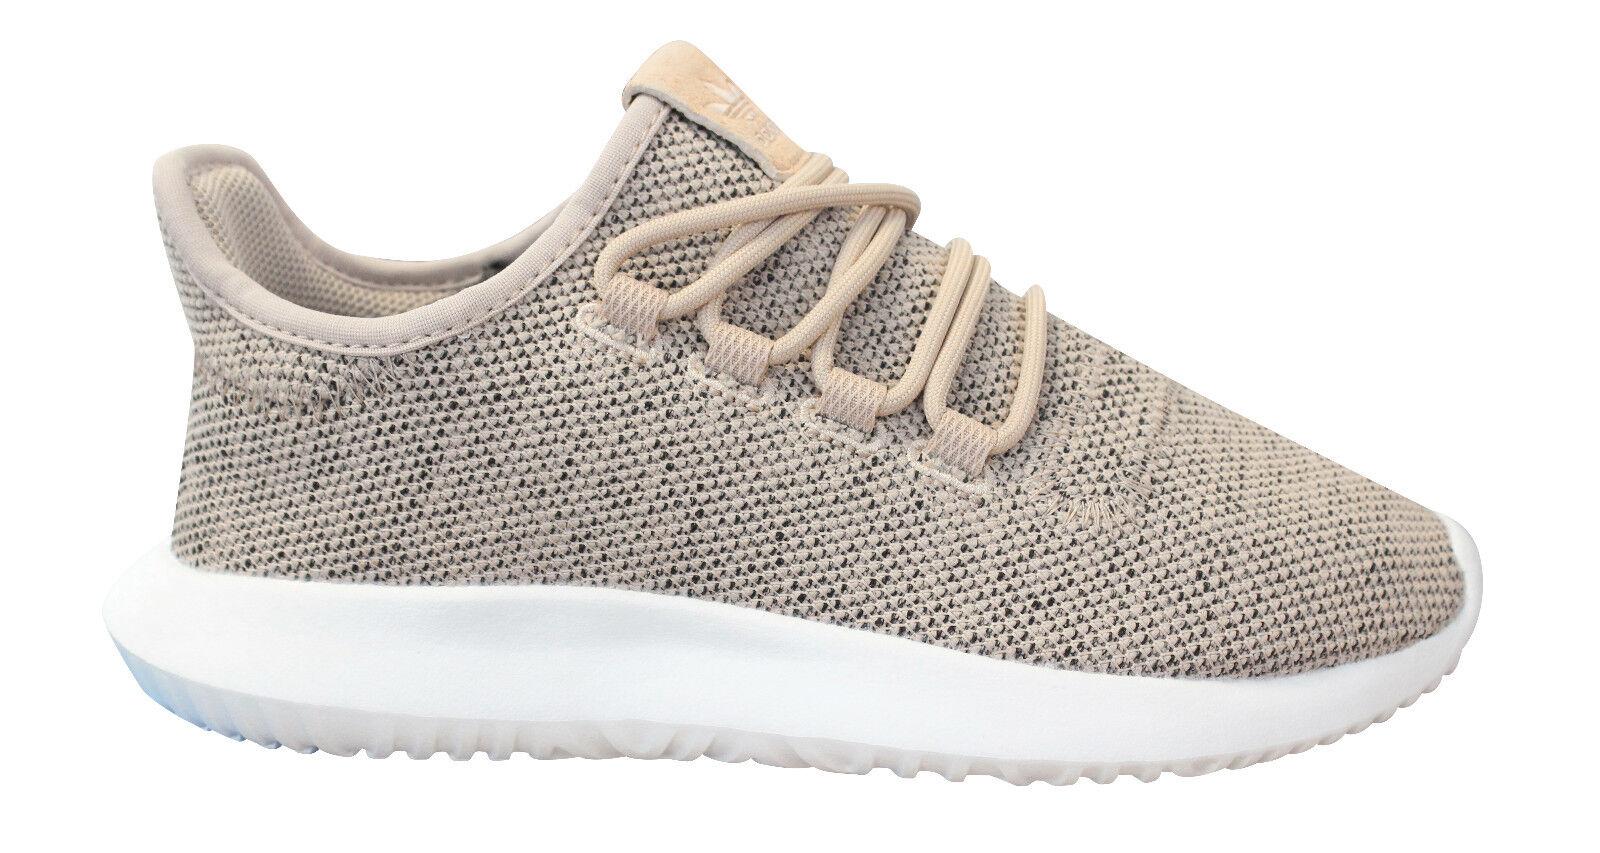 Adidas Originals Tubular Shadow Damenschuhe Up Trainers Lace Up Damenschuhe Schuhes CG4515 M17 5952cc